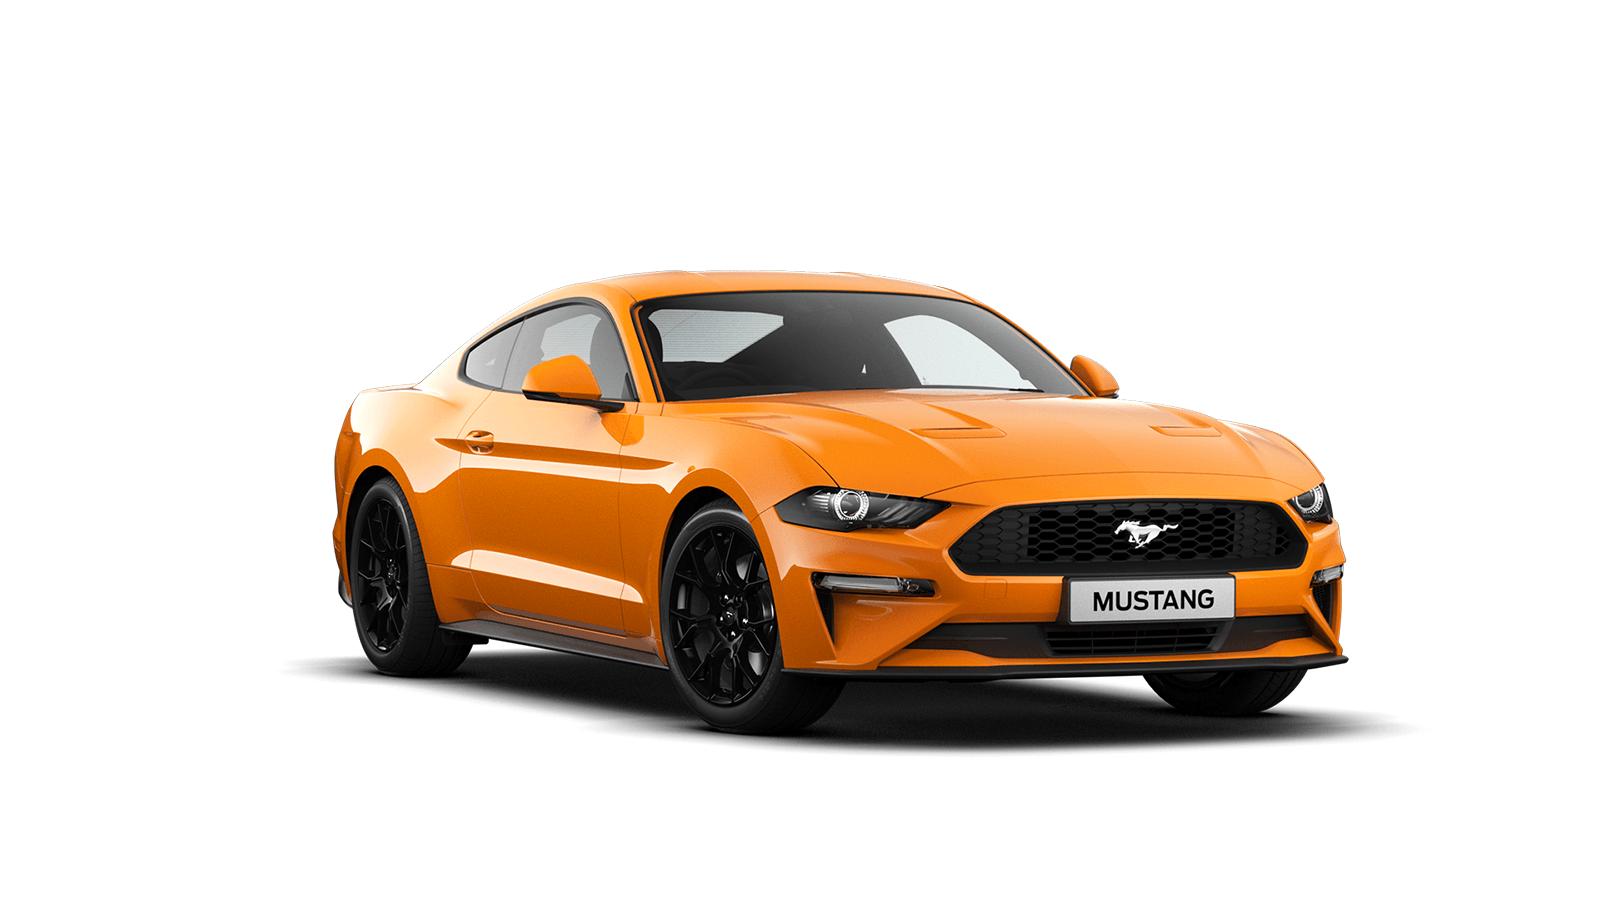 NEW MUSTANG 2.3 EcoBoost Fastback in Orange Fury